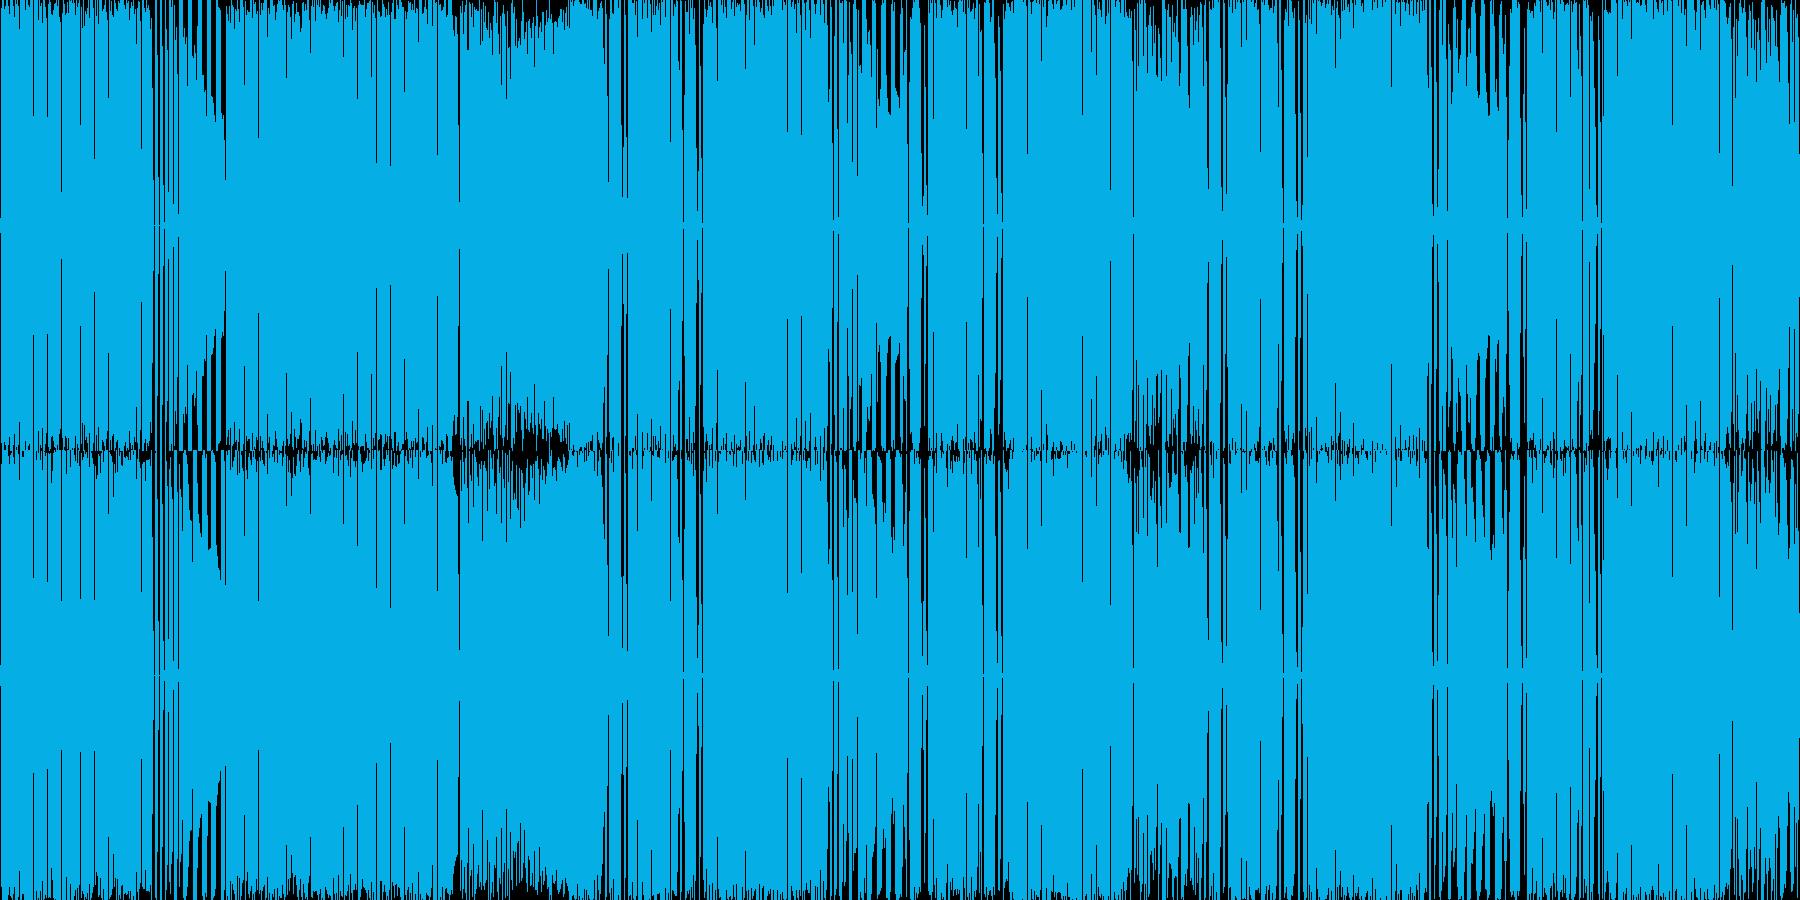 【FMシンセ/ロック/ダブステップ】の再生済みの波形